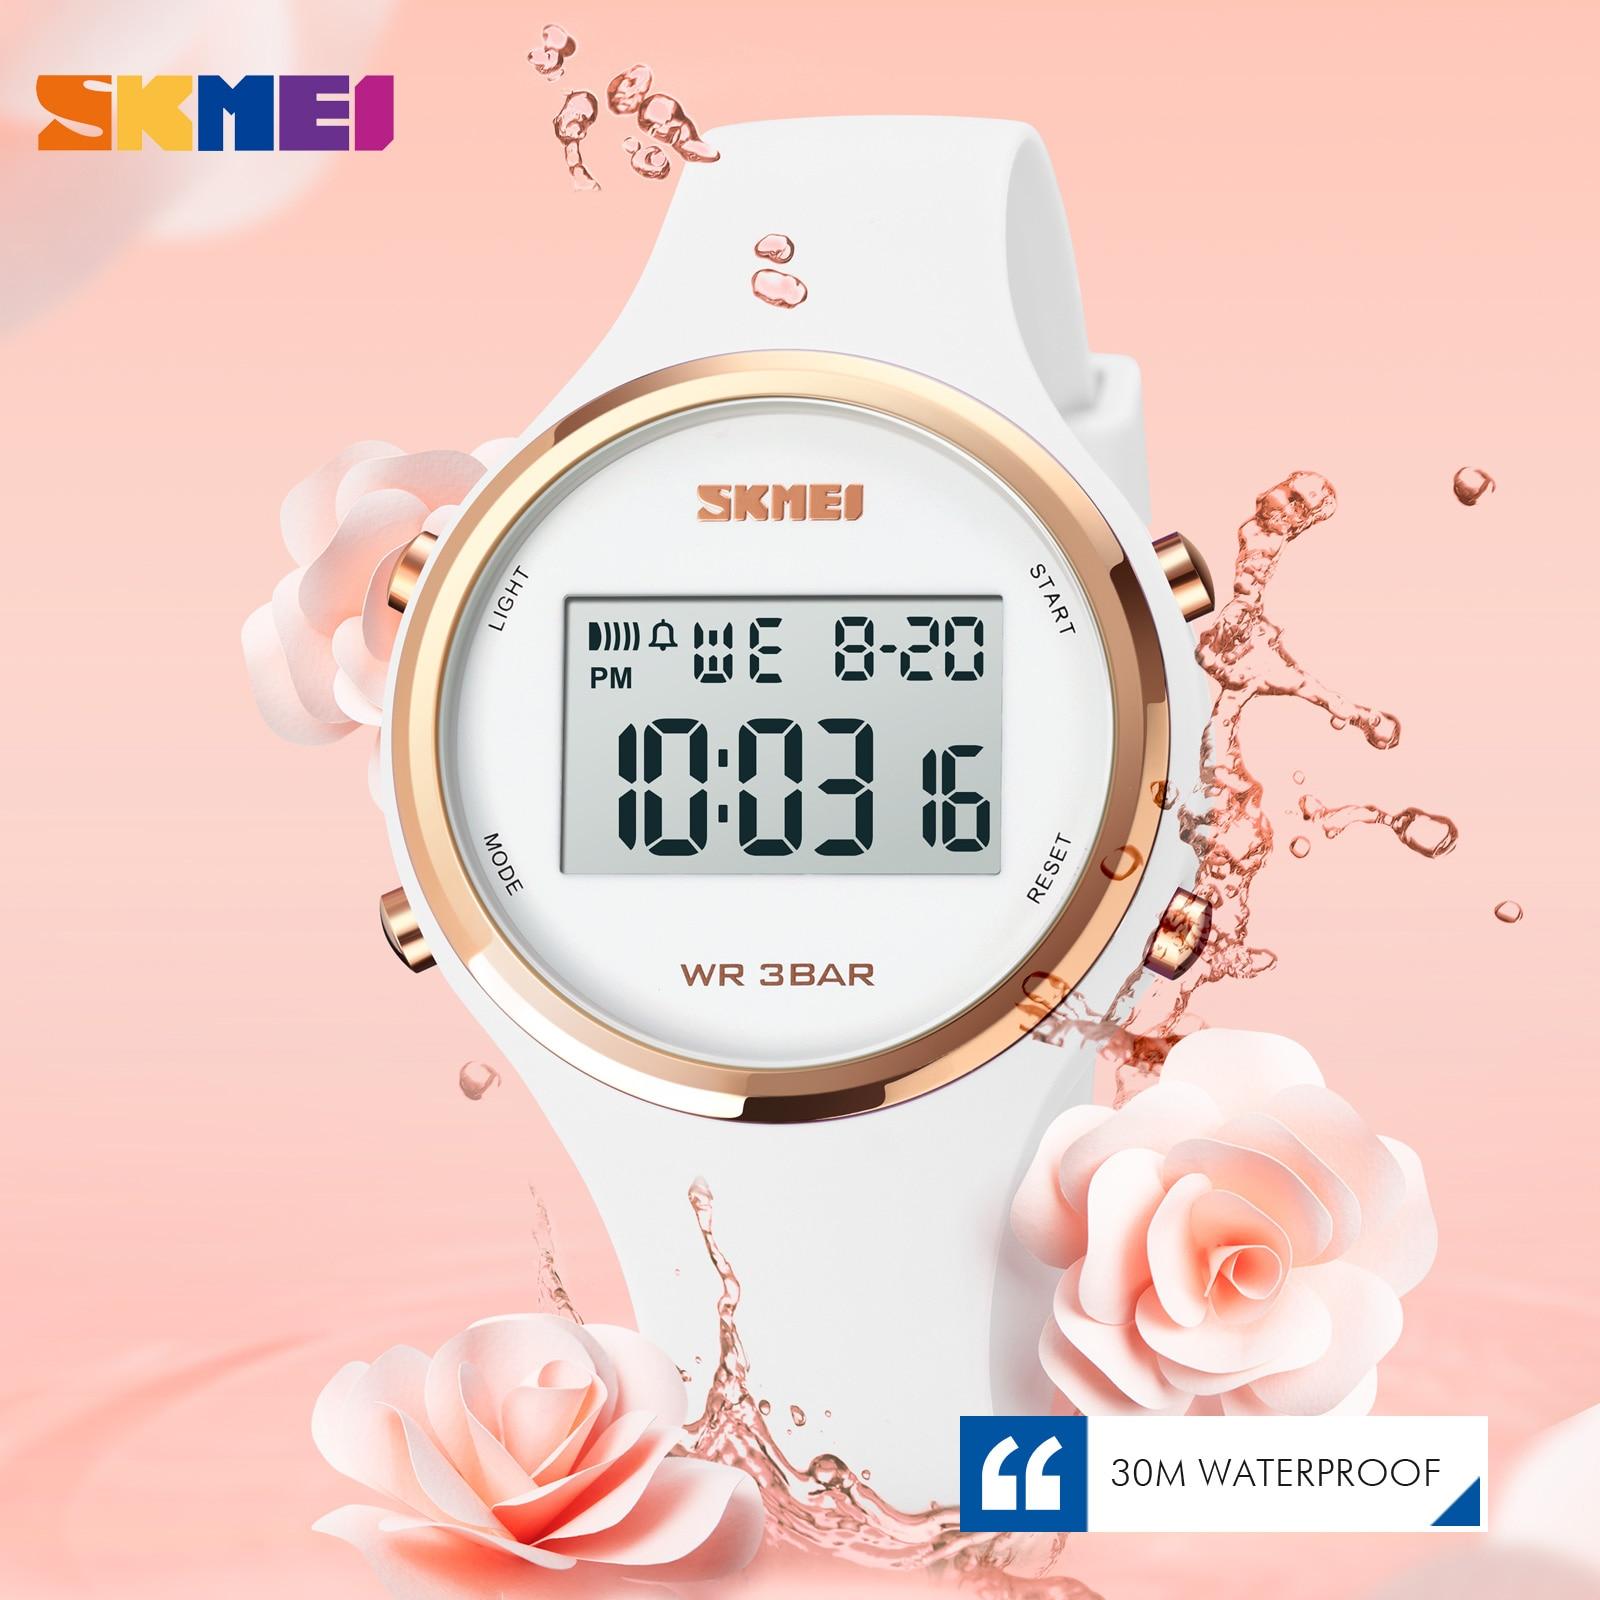 SKMEI العلامة التجارية النساء LED عرض الكهربائية ساعة موضة كرونو المنبه ساعة رقمية امرأة الأرجواني الأسود Wirstwatch Reloj Mujer 1720